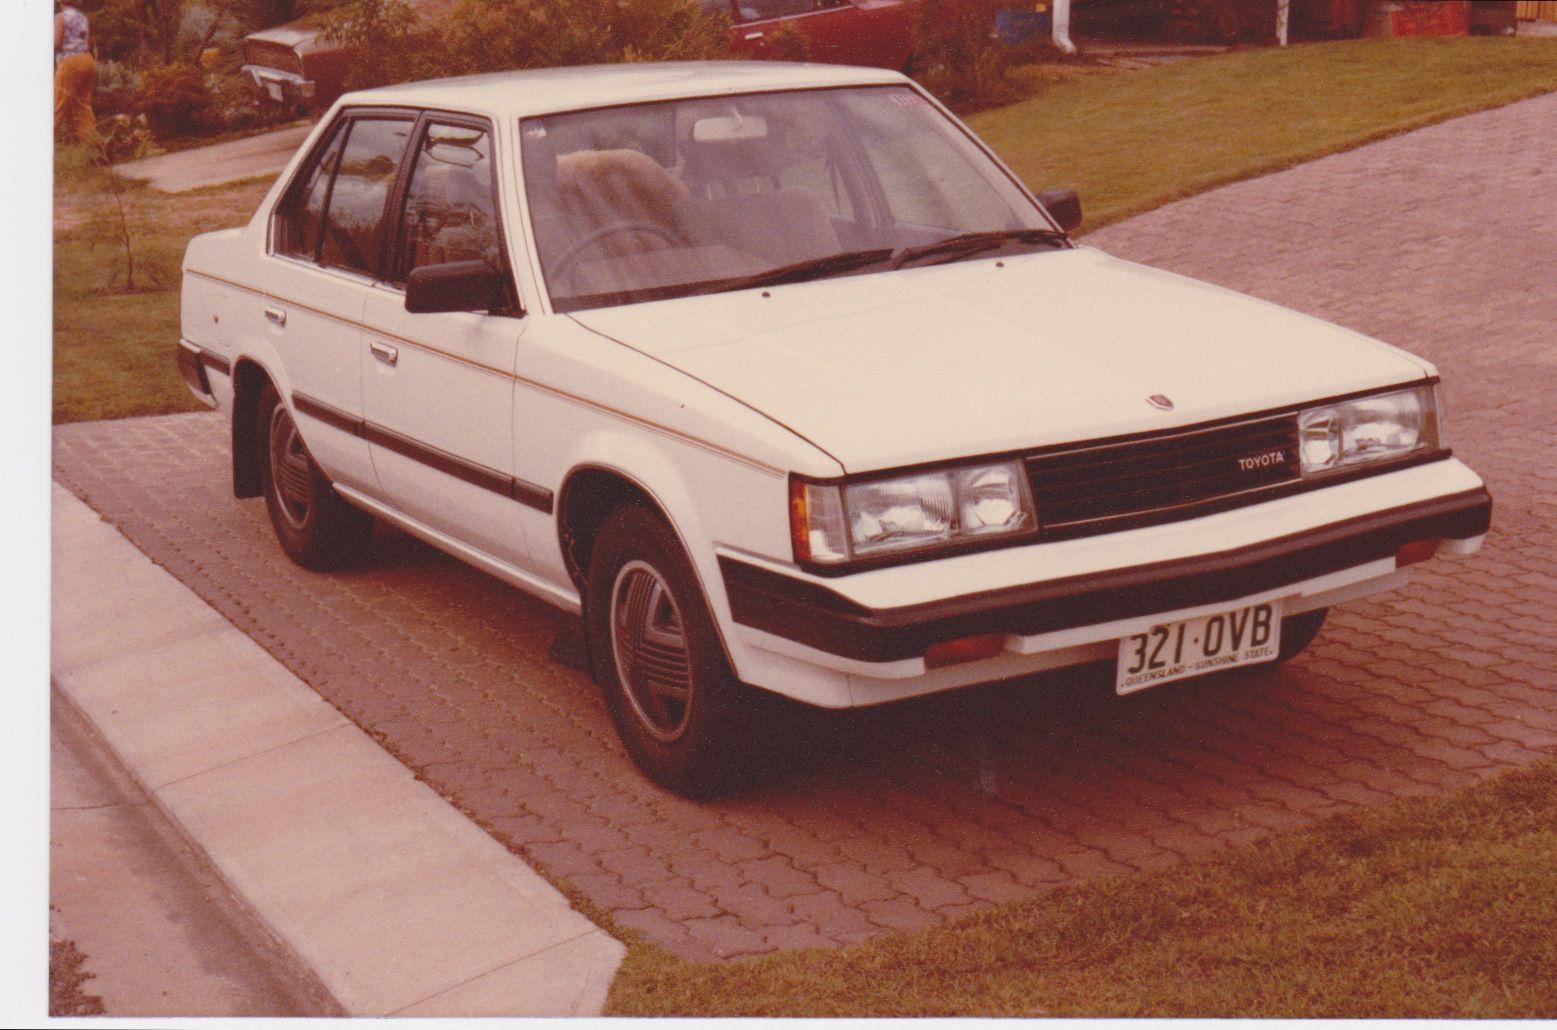 toyota corona cs x two litre four cylinder manual 1983 1985 we rh pinterest co uk 1989 Toyota Corona 1989 Toyota Corona